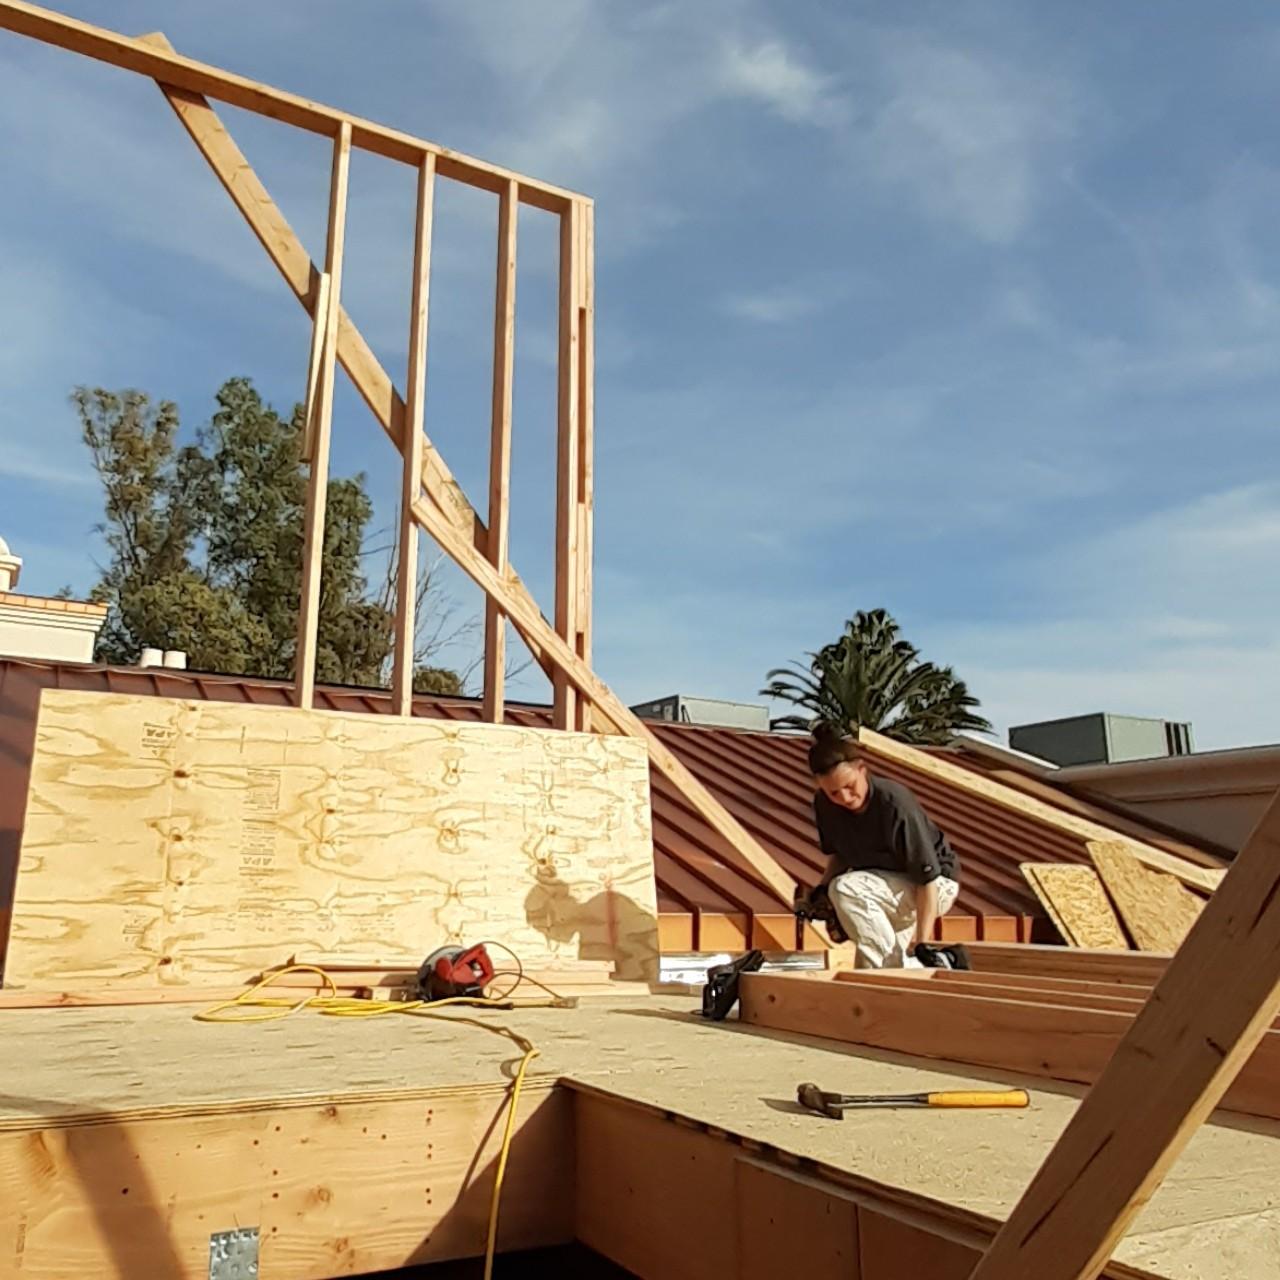 carpentry-wood-framing-second-floor-home-addition--framing-71